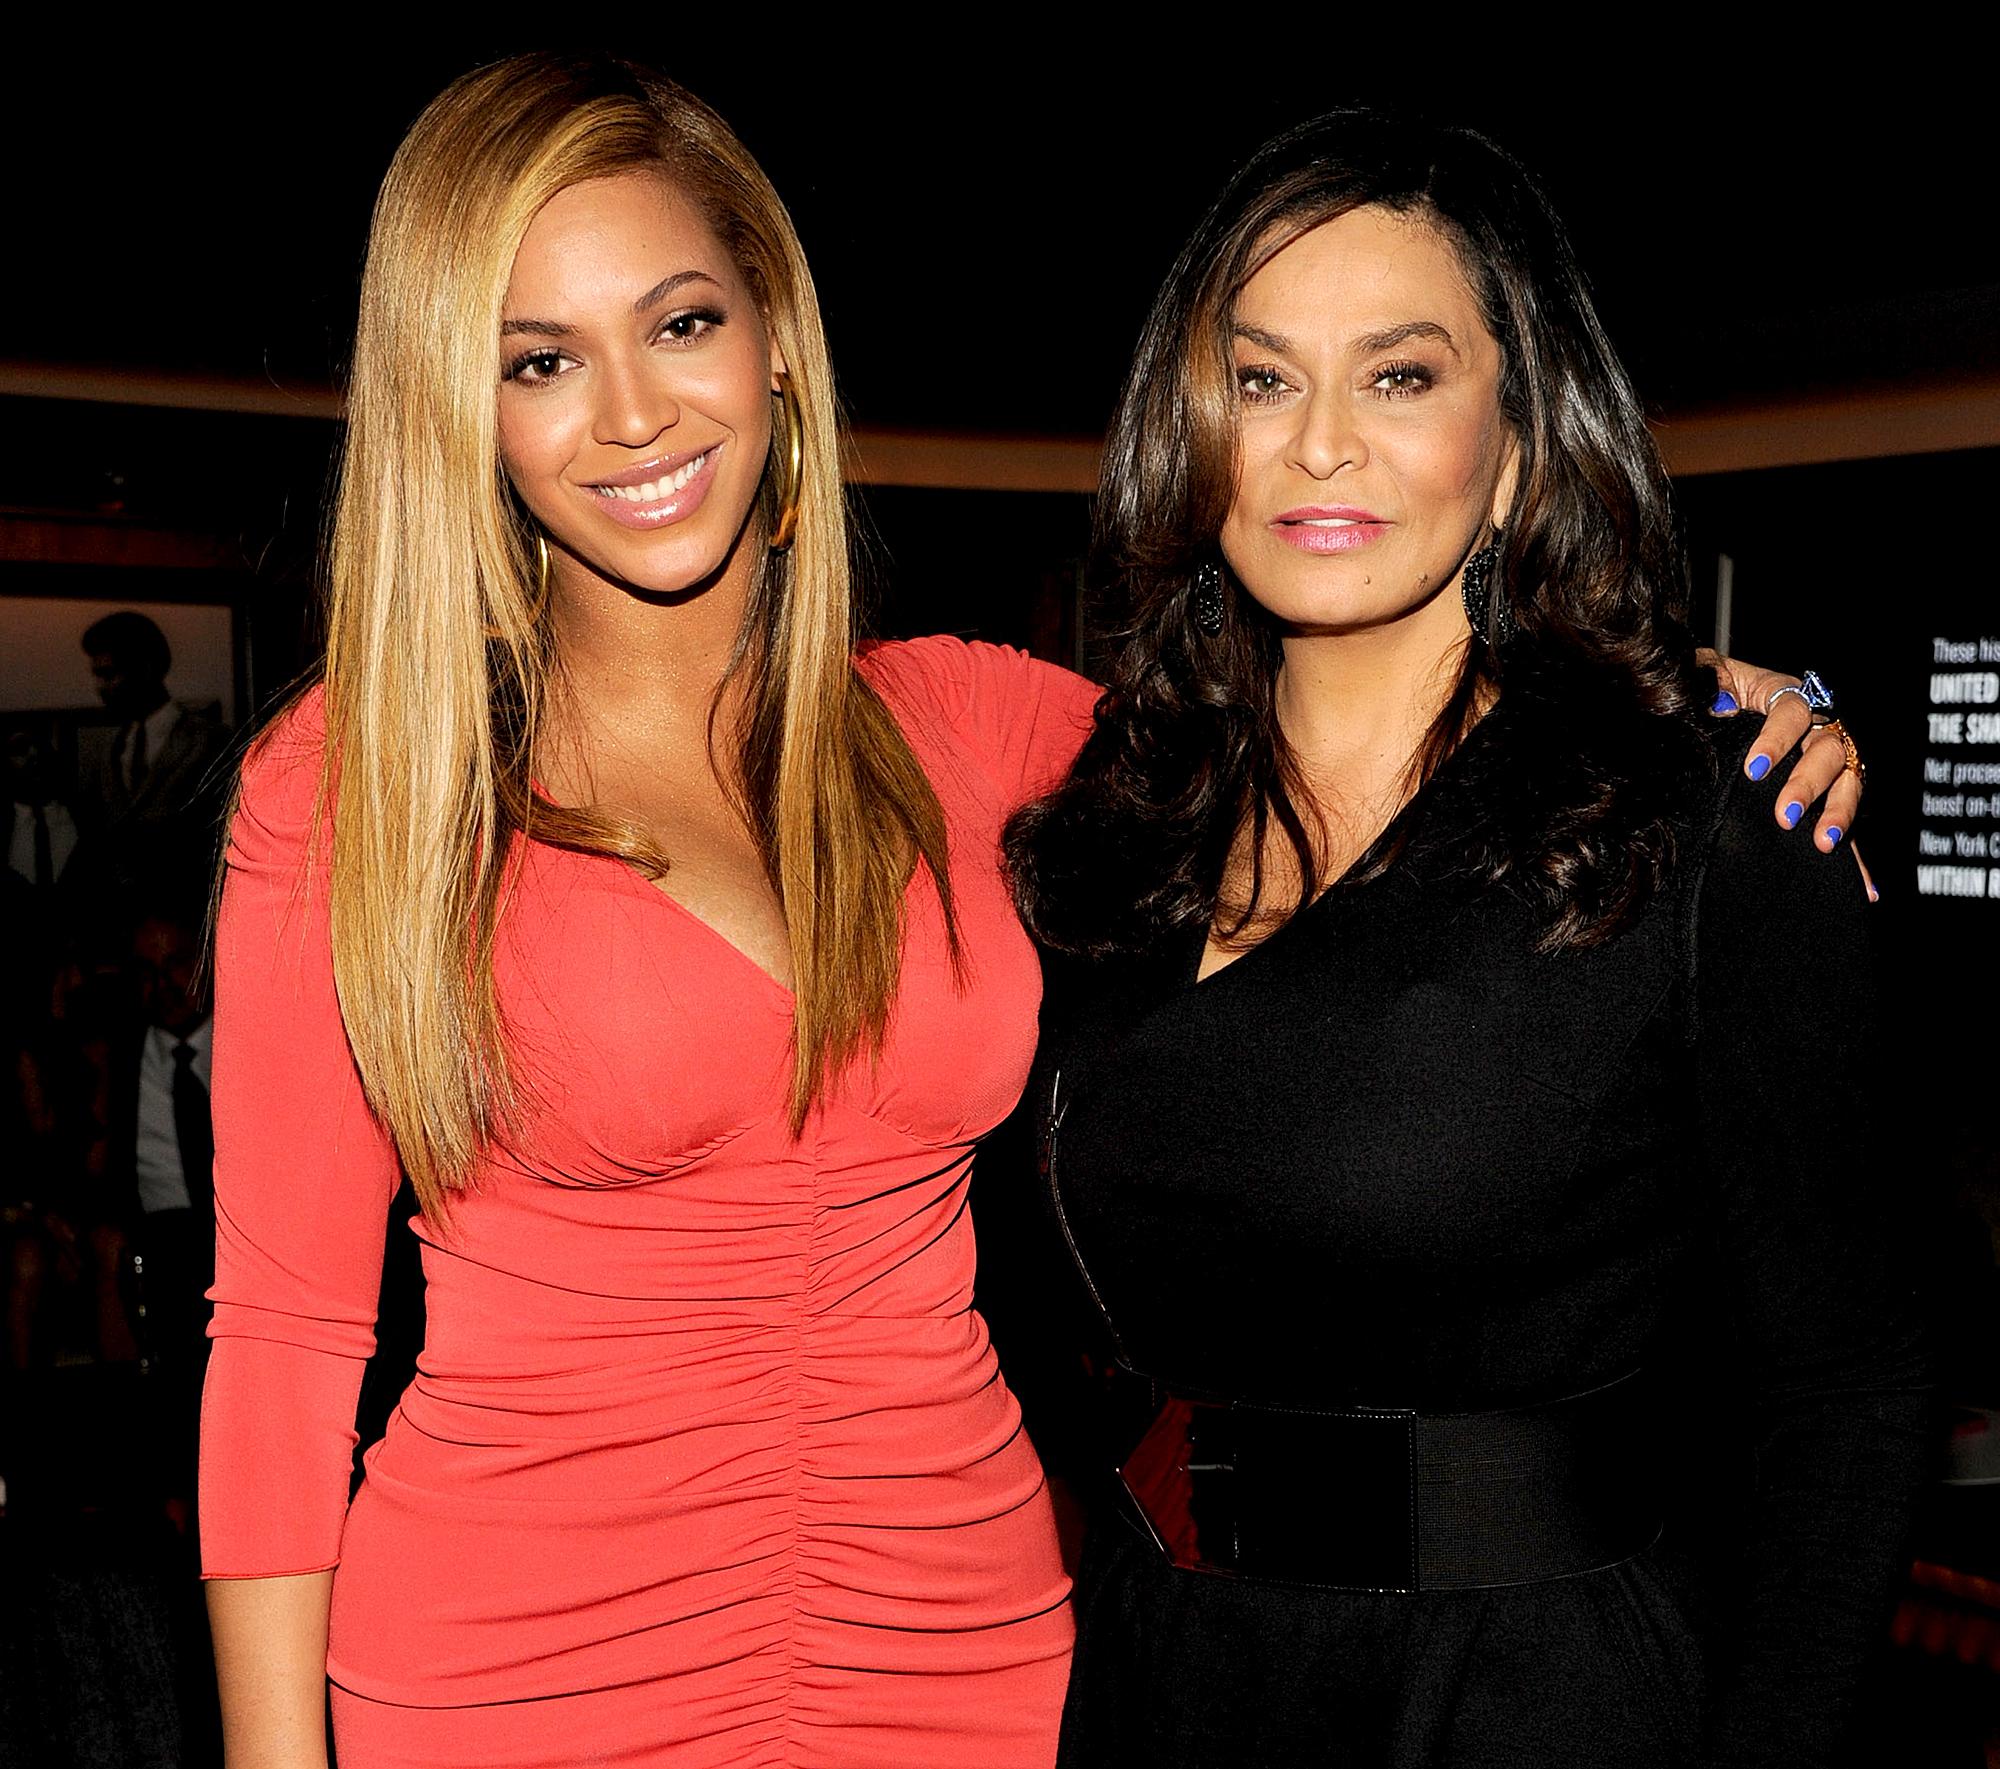 Beyonce-and-Tina-Knowles - Beyonce and Tina Knowles